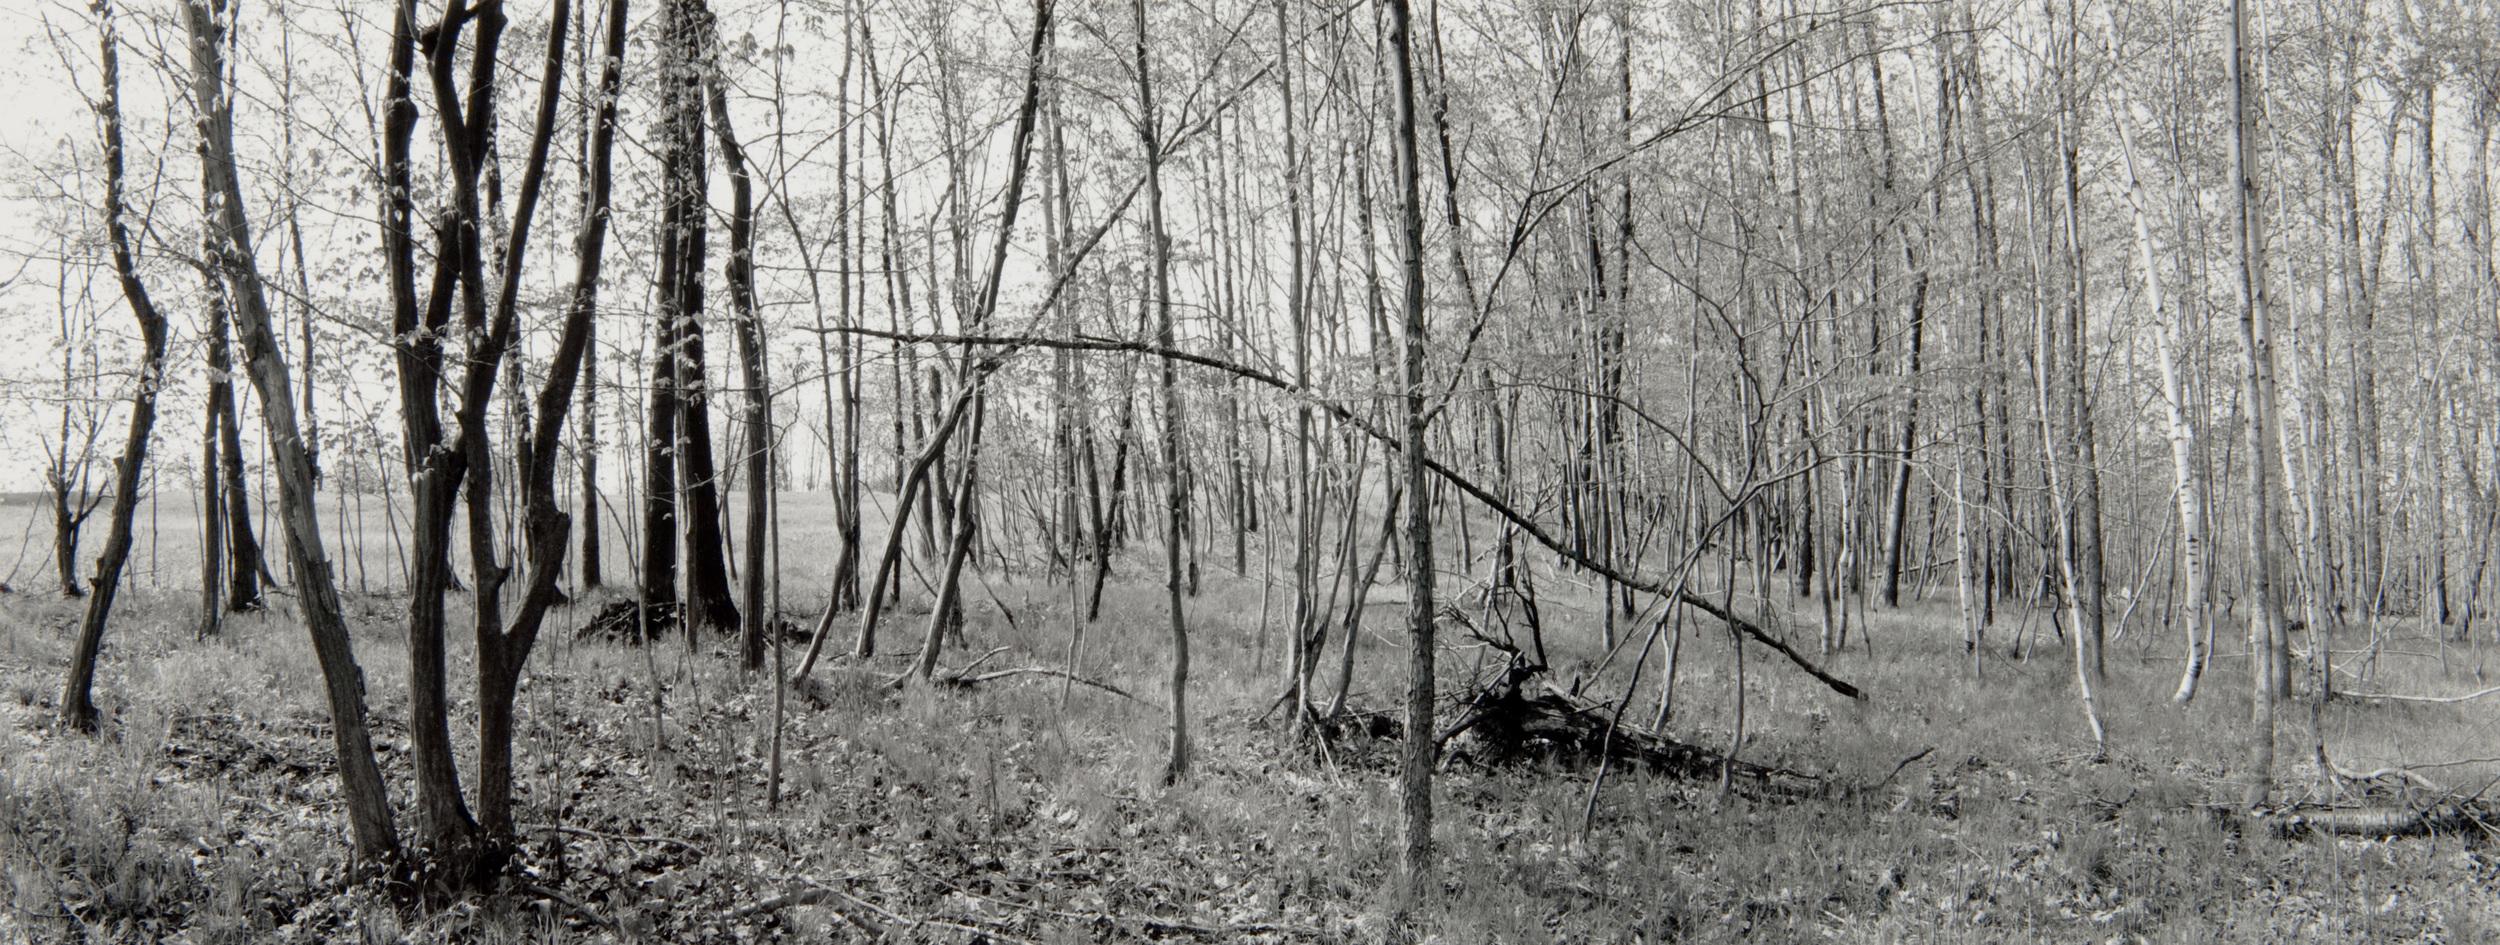 E. Lindbloom, Light Woods, Saratoga Battlefield, 1996, gsp.jpg